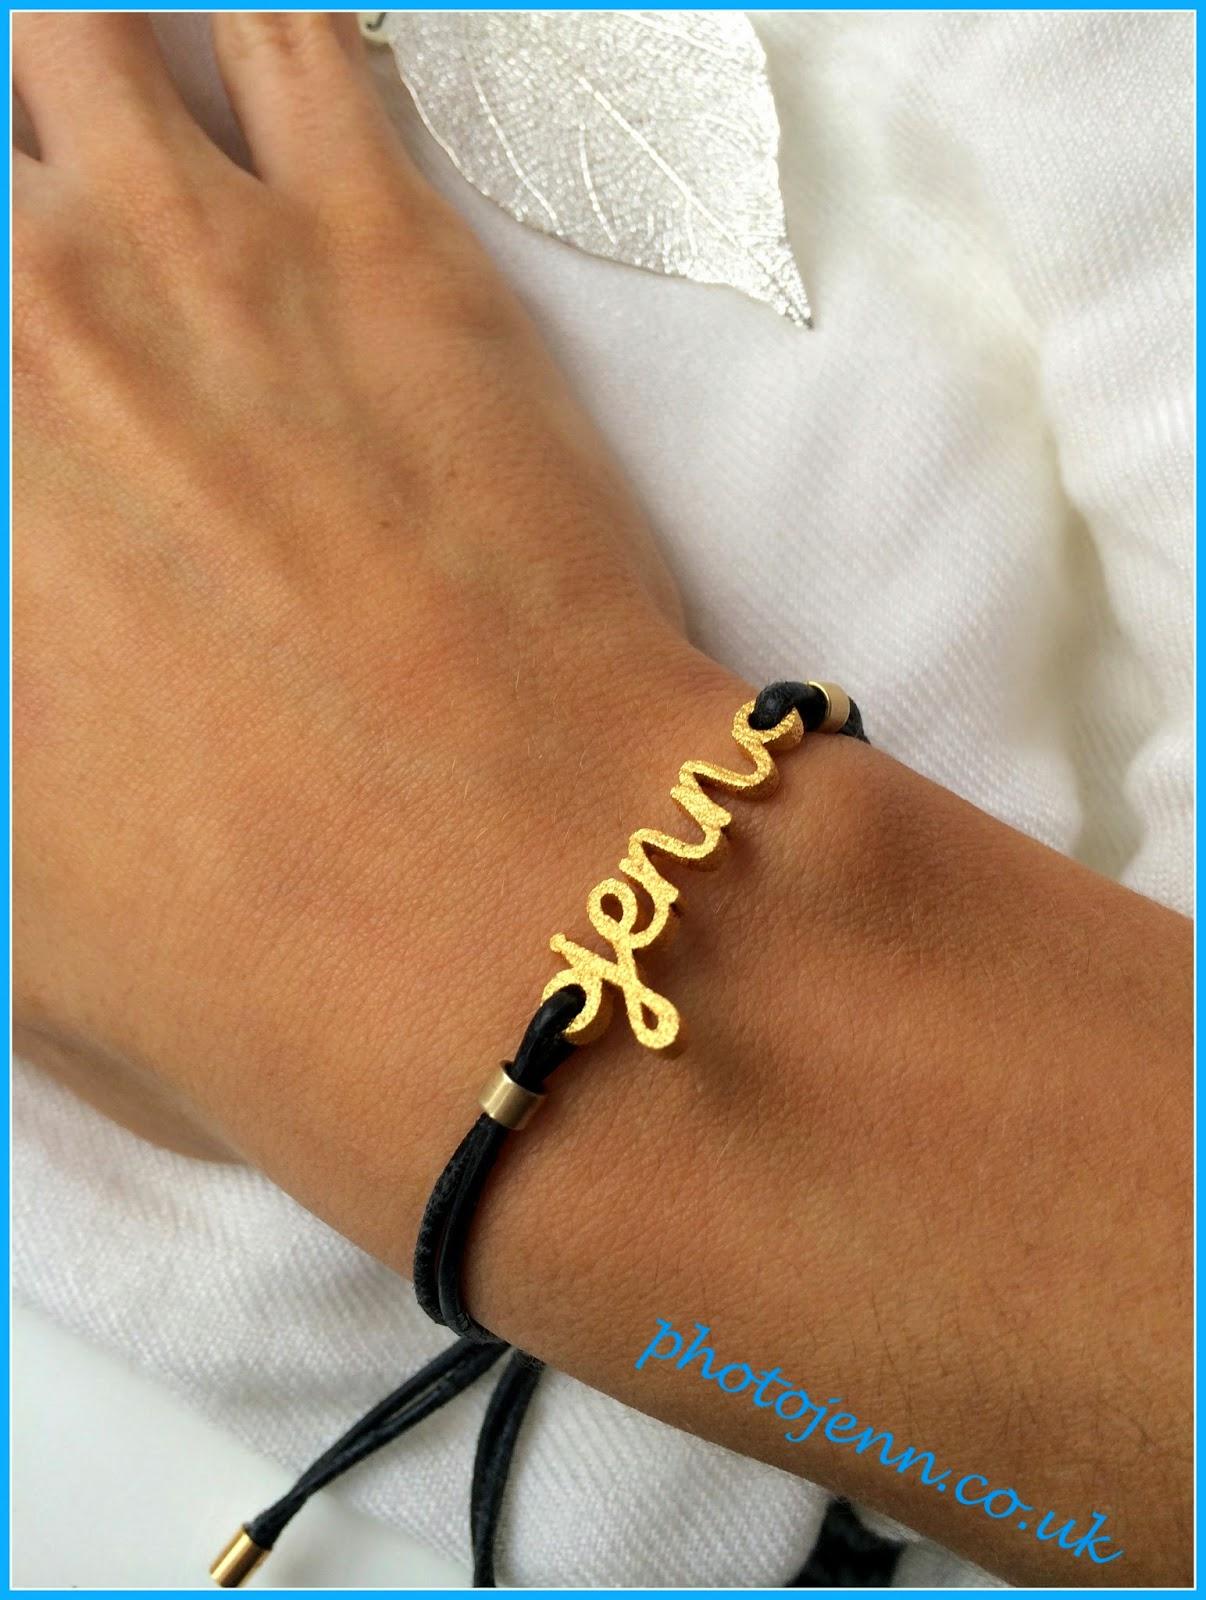 Zazzy-personailsed-name-bracelet-wordplay-gold--black-cord